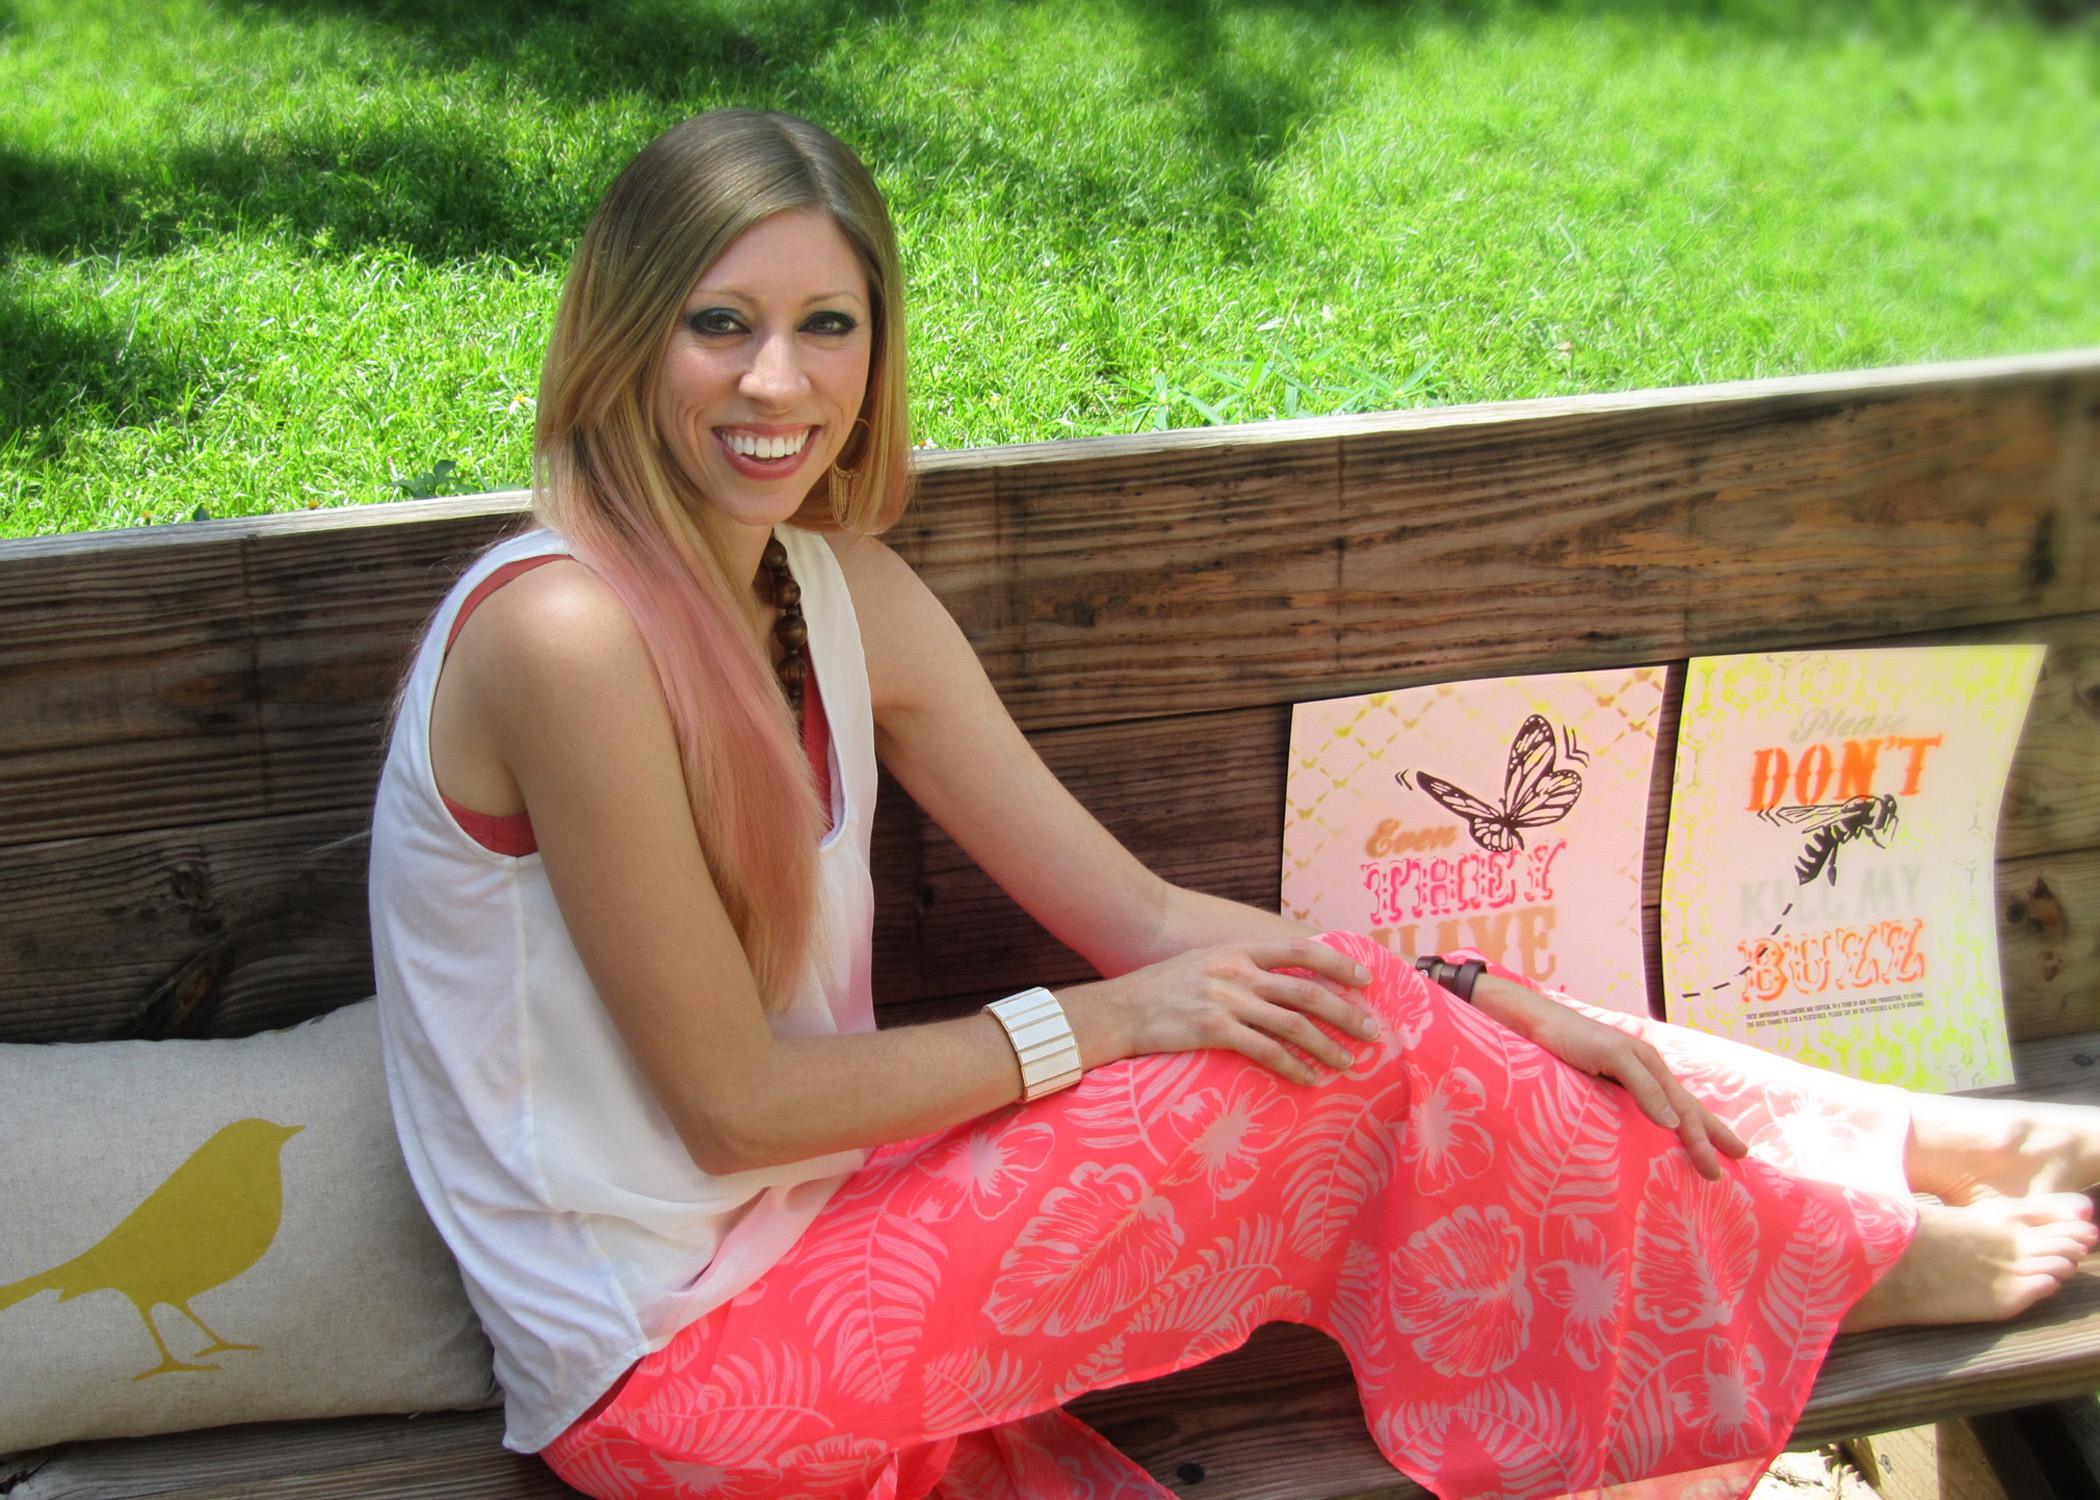 Embody Your Muse Creative Spotlight: Melanie Oliva (Photographer, Horiz)